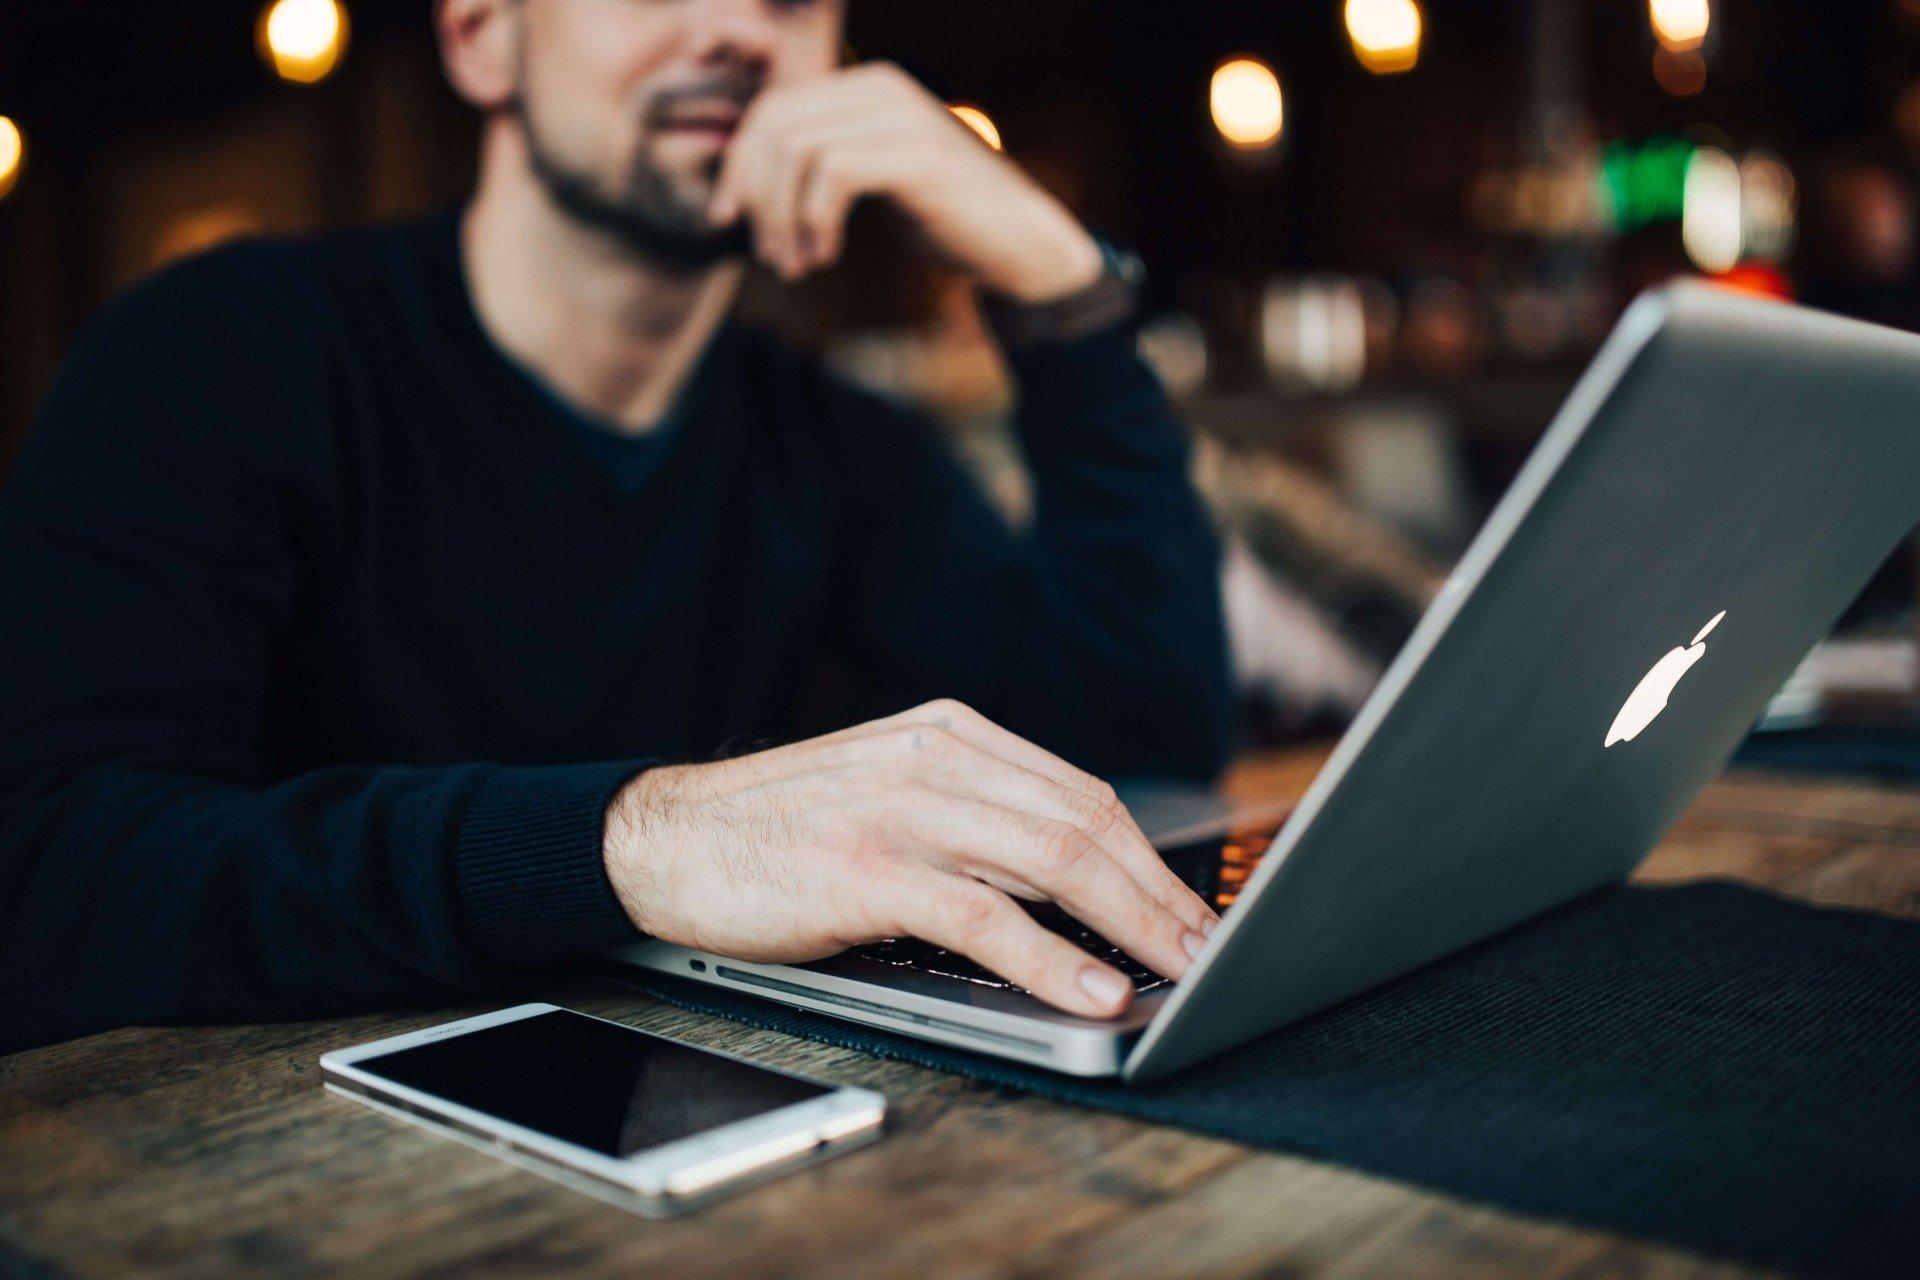 Kaboompics Man Laptop Mobile Phone 1920x1280